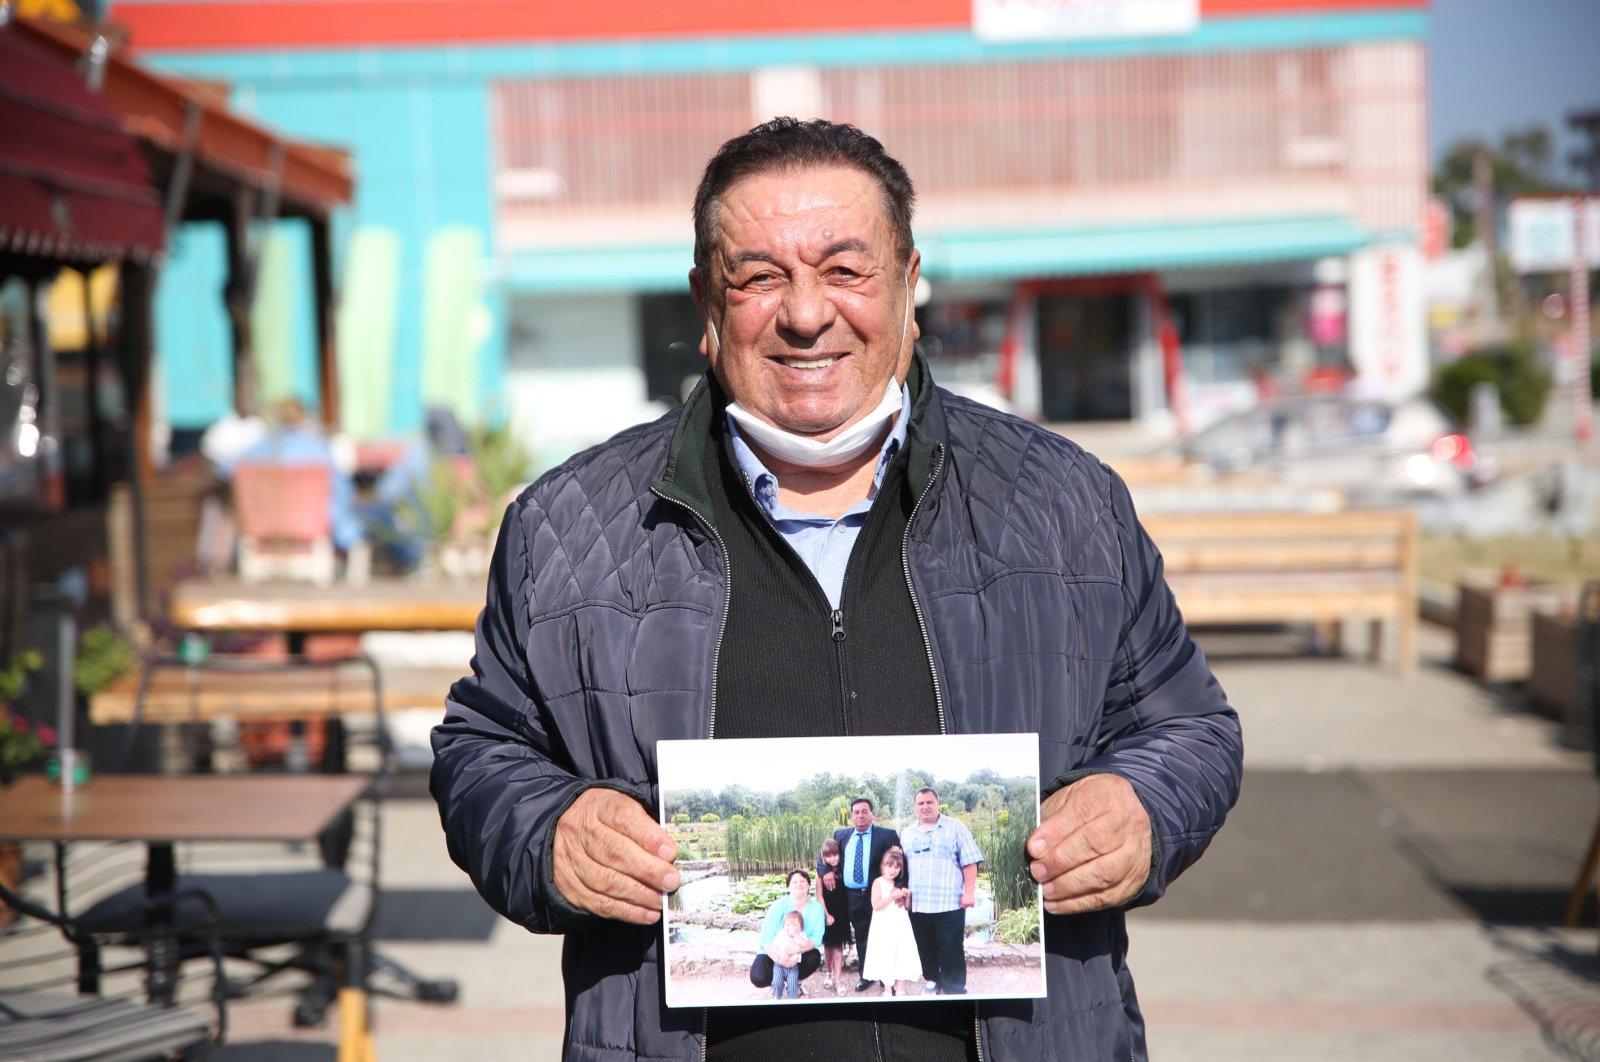 Ahmet Büyüközdemir tells the story of opening his home and heart 28 years ago to a homeless Russian boy named Vladislav Nelbuyin, Antalya, Turkey, Nov. 18, 2020. (AA Photo)